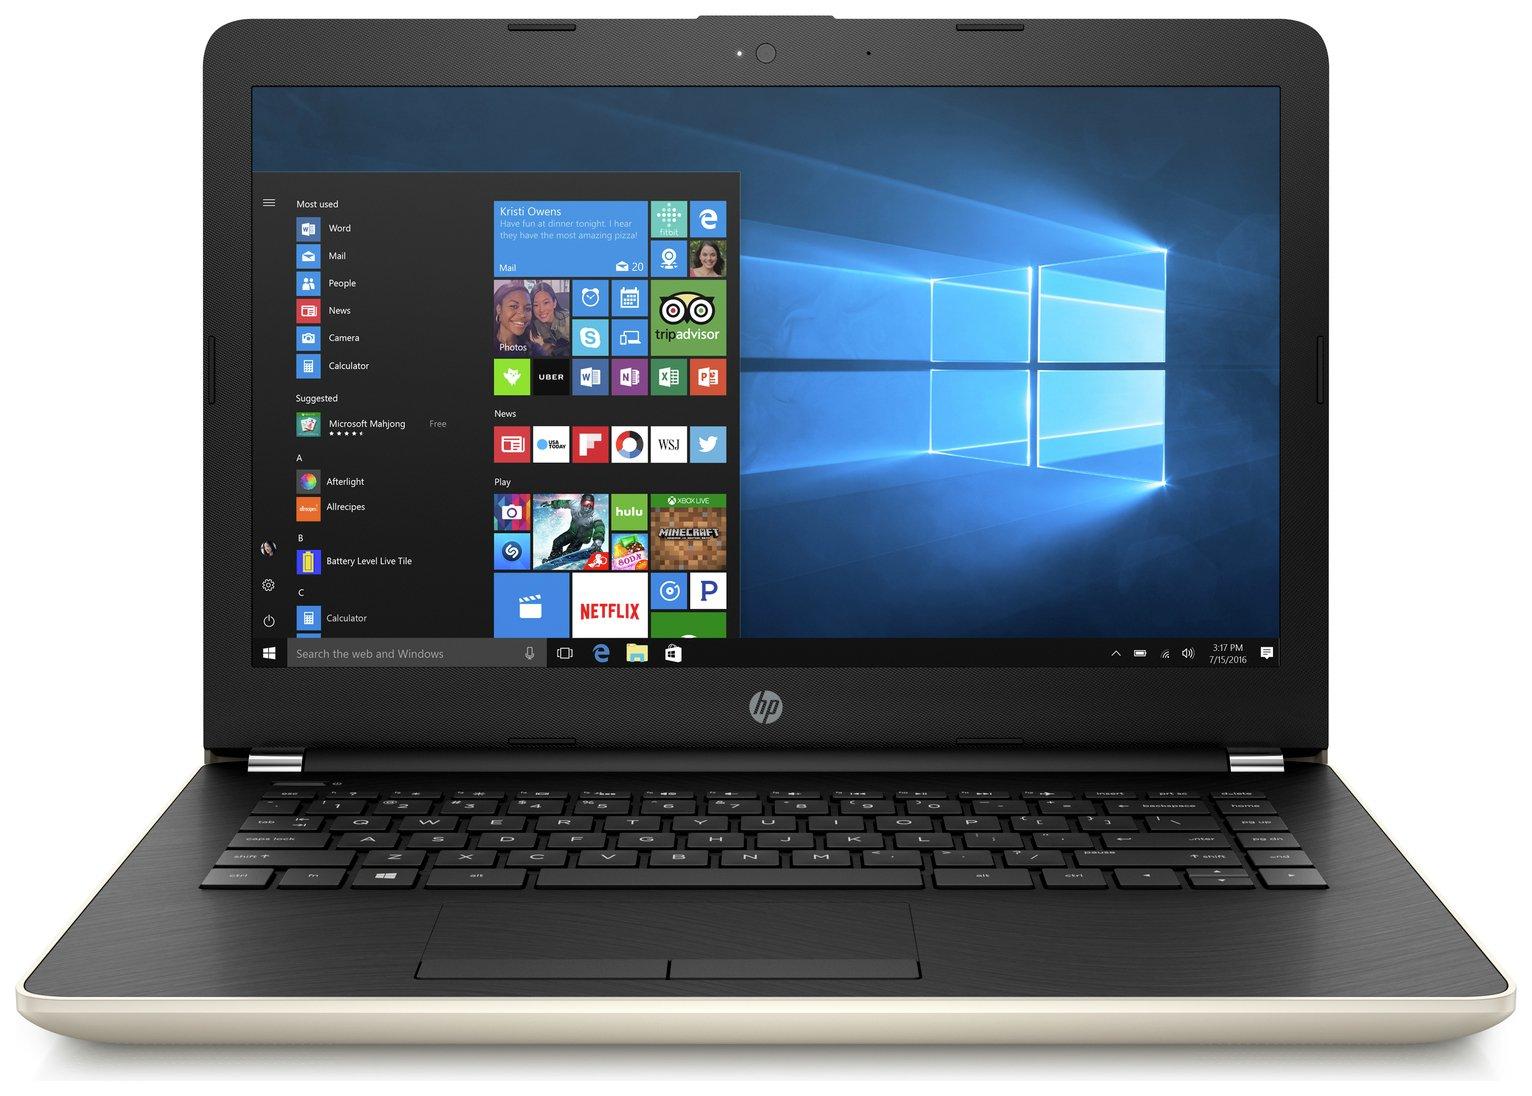 HP 14 Inch Intel Pentium 4GB 256GB Laptop - Gold